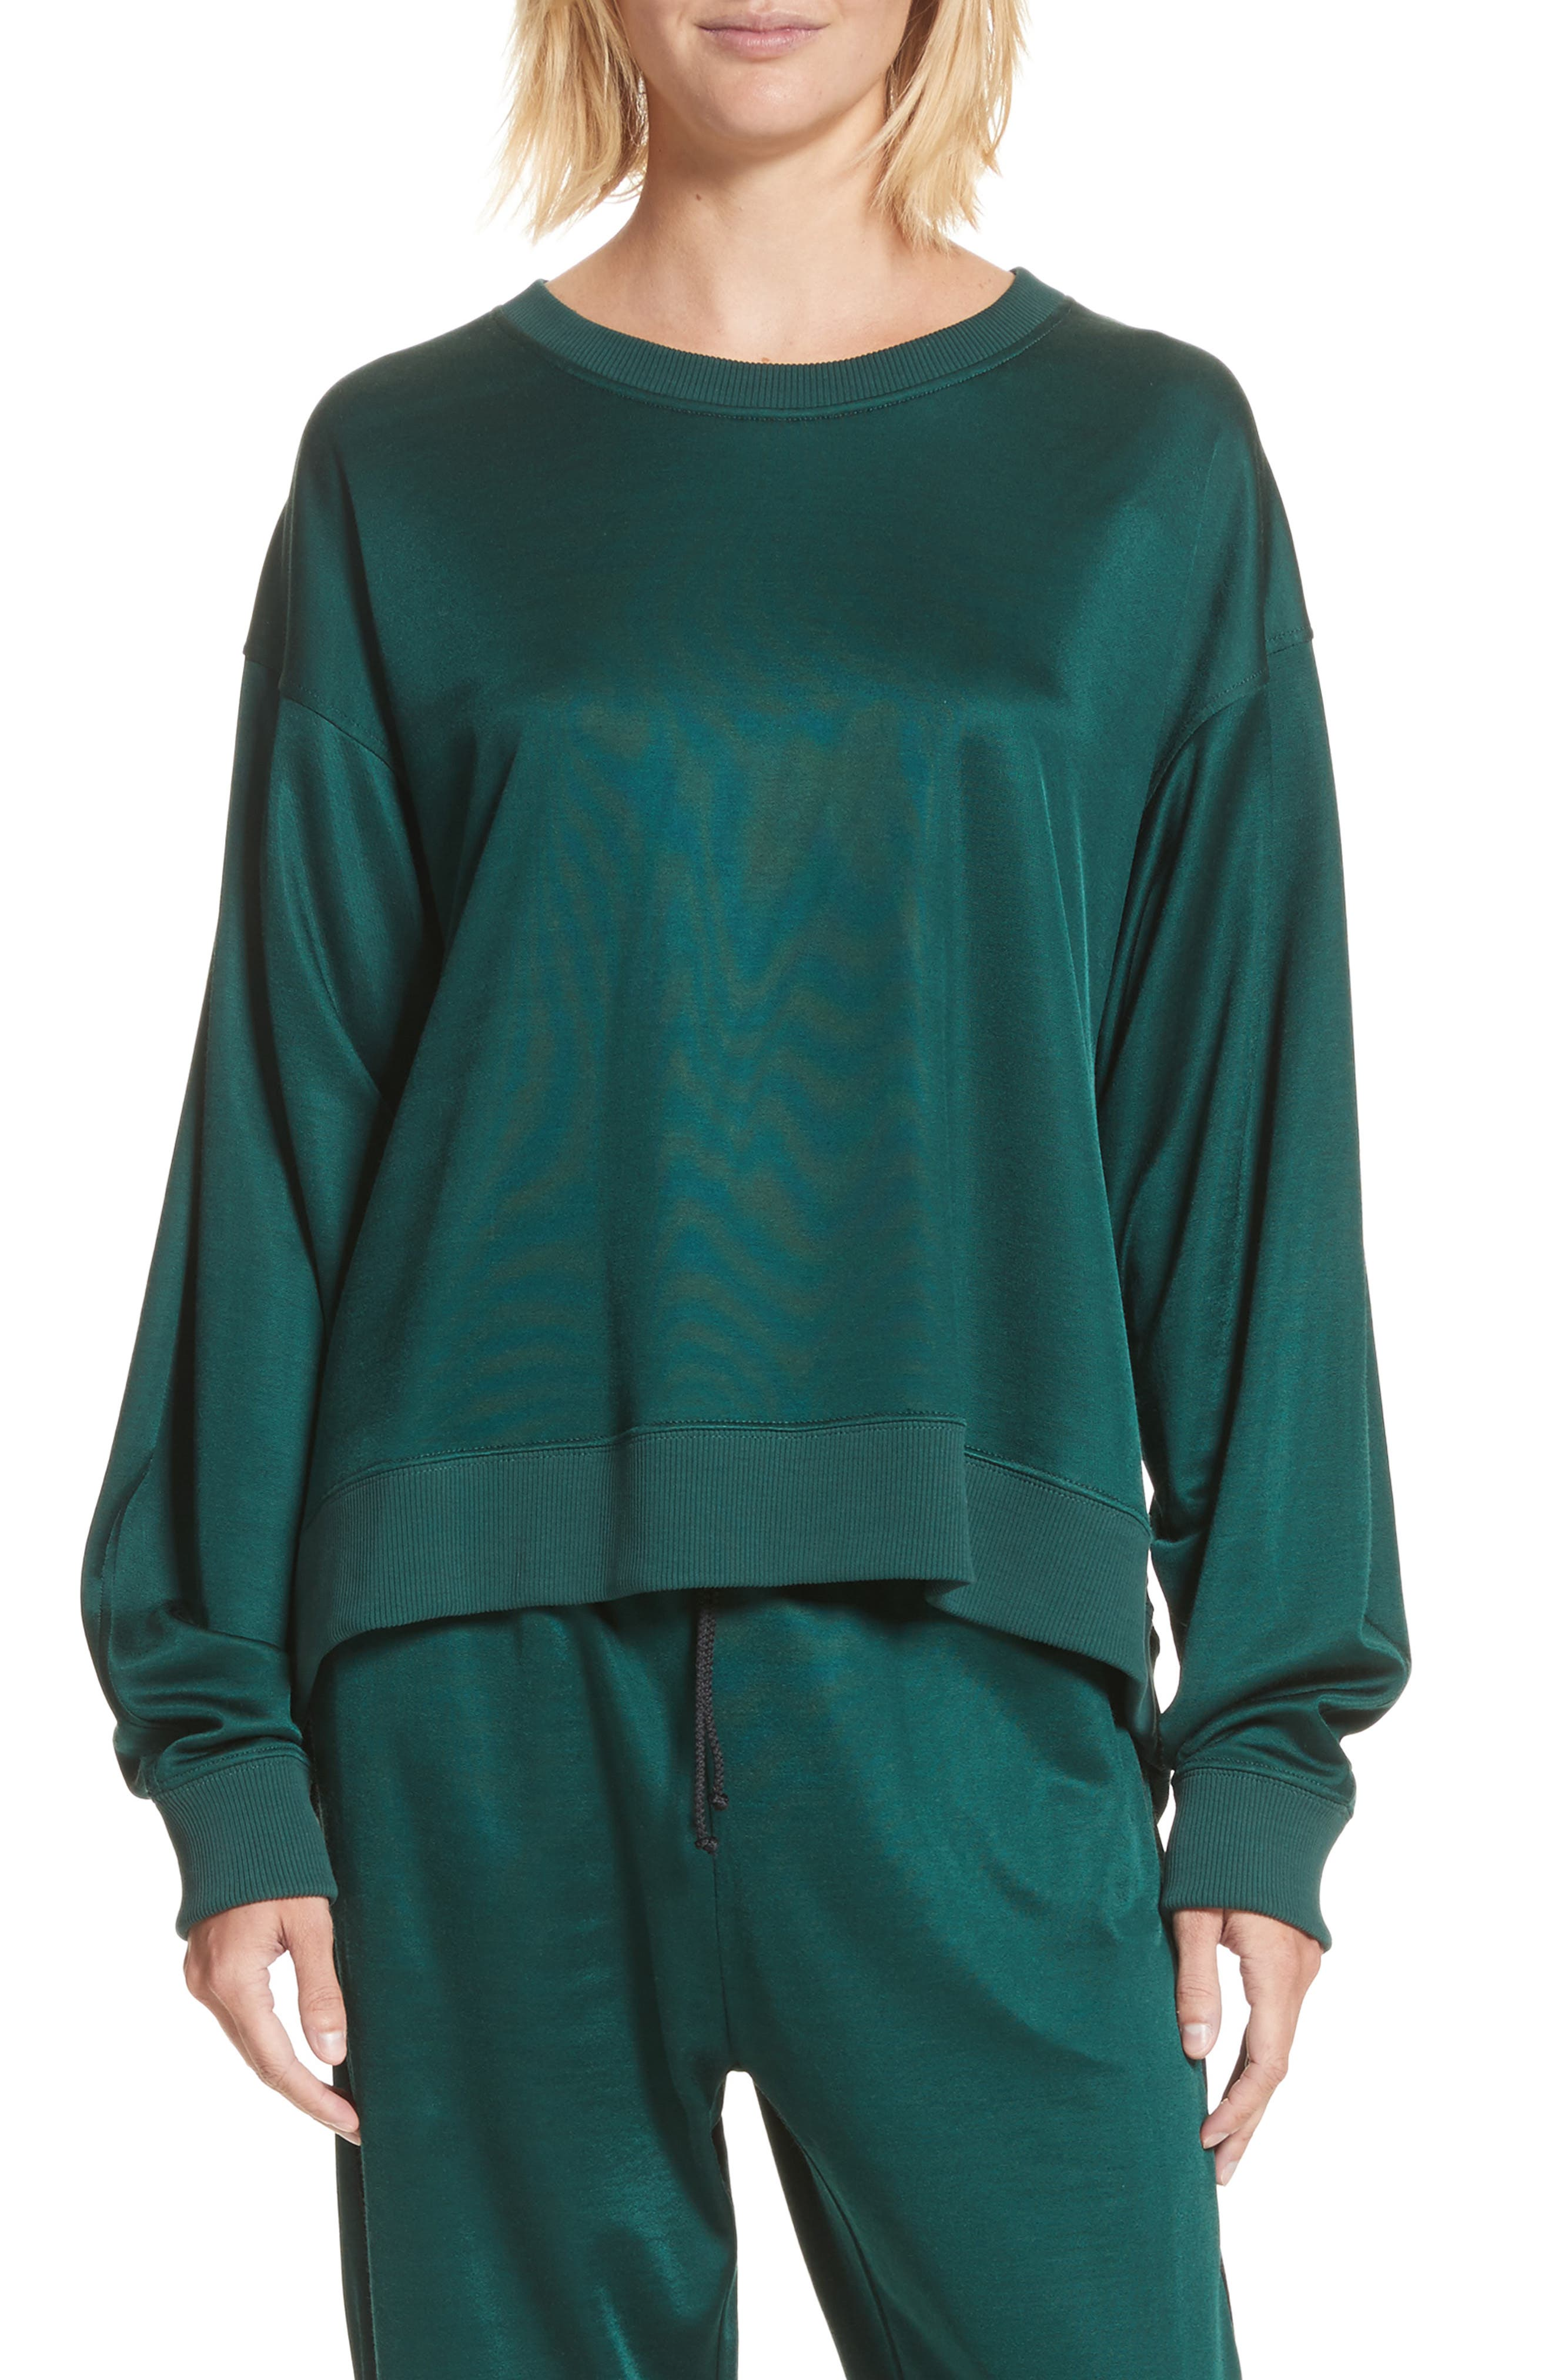 MM6 Maison Margiela Track Suit Pullover